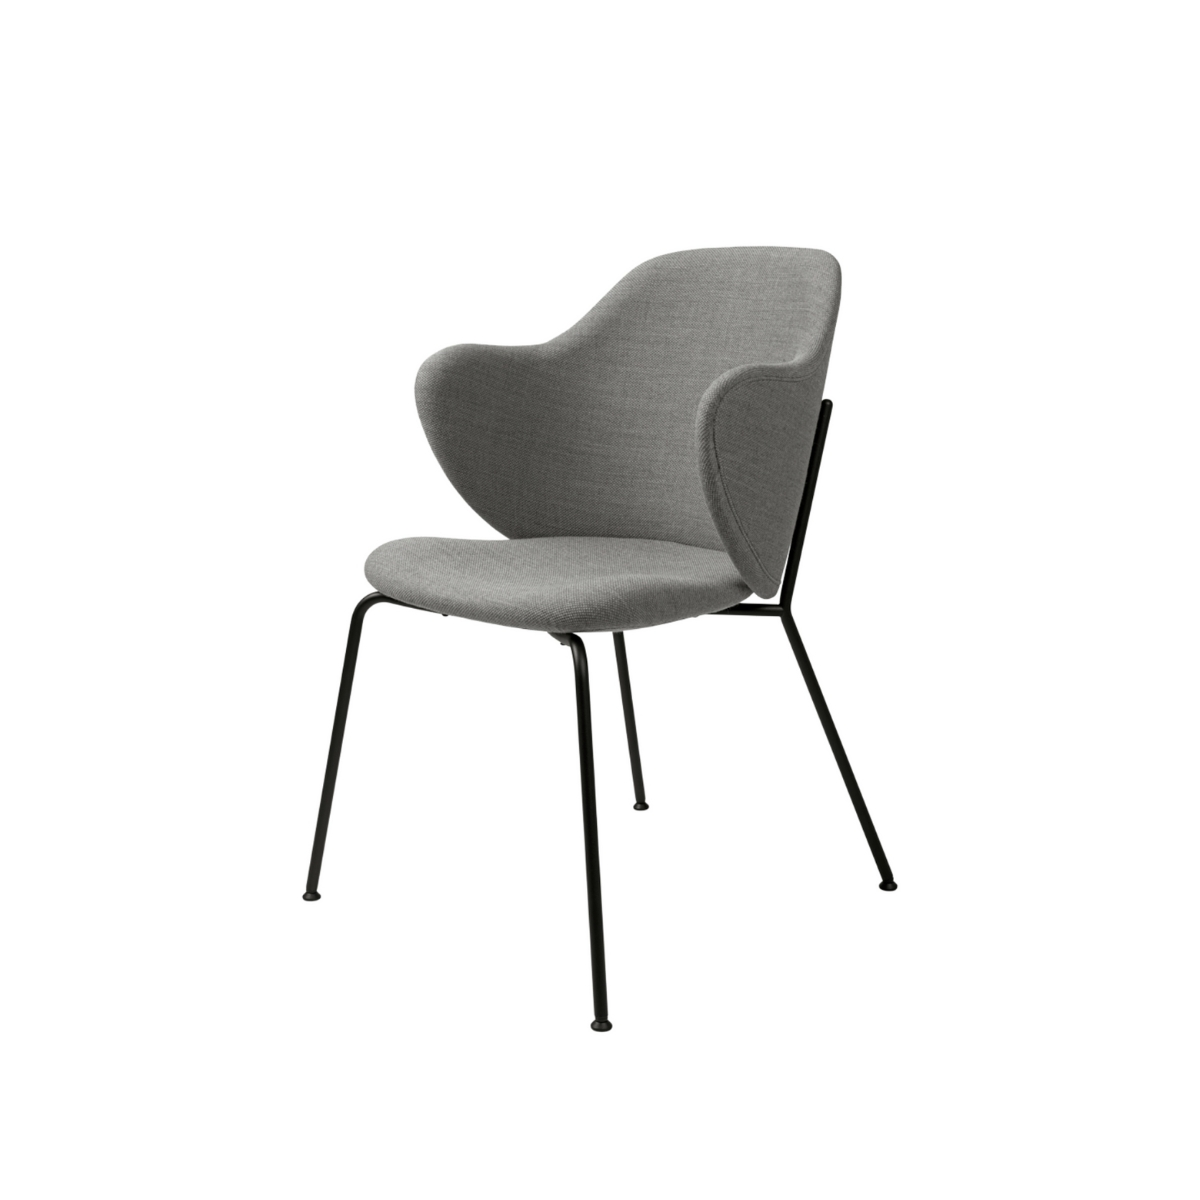 By Lassen | Lassen Chair - Fiord - Bolighuset Werenberg